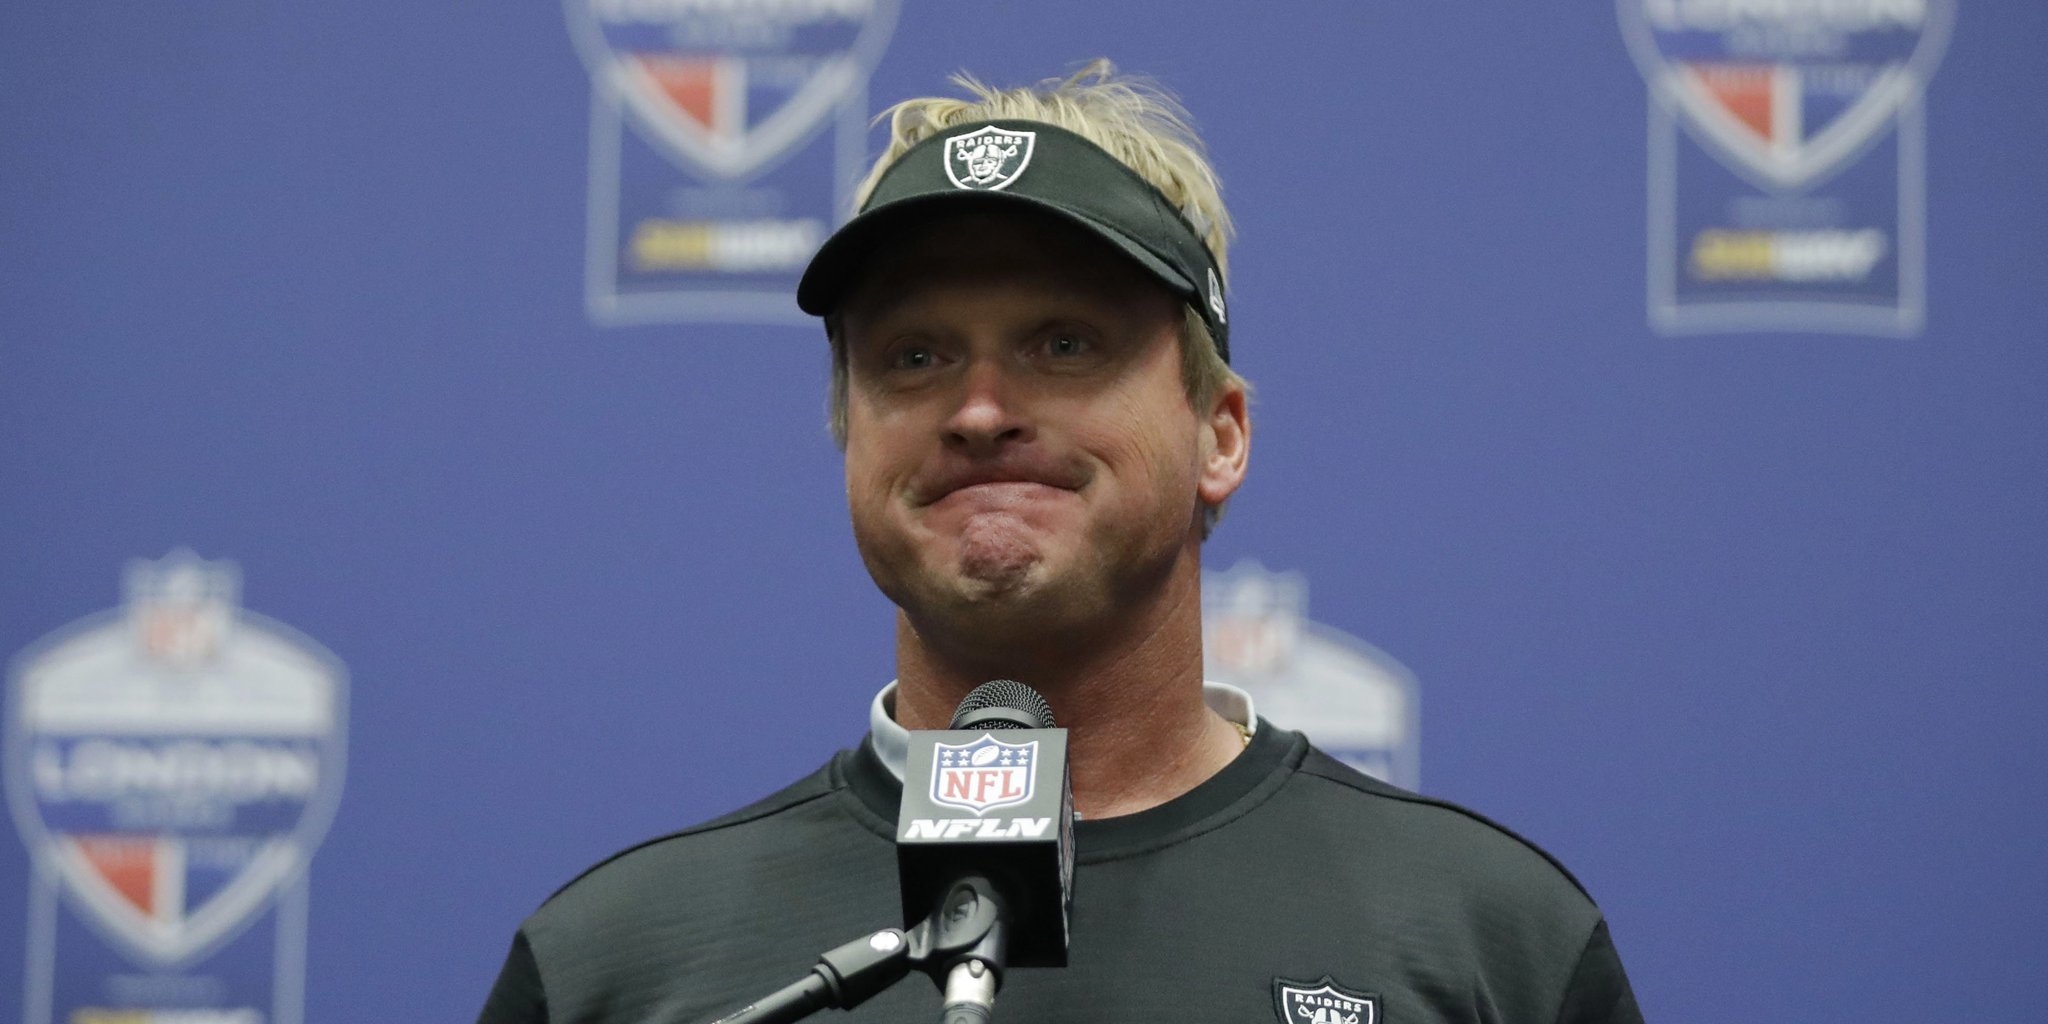 Gruden: Raiders 'aren't tanking' for top draft pick https://t.co/NaNNChMHjx https://t.co/vYI6ripC25